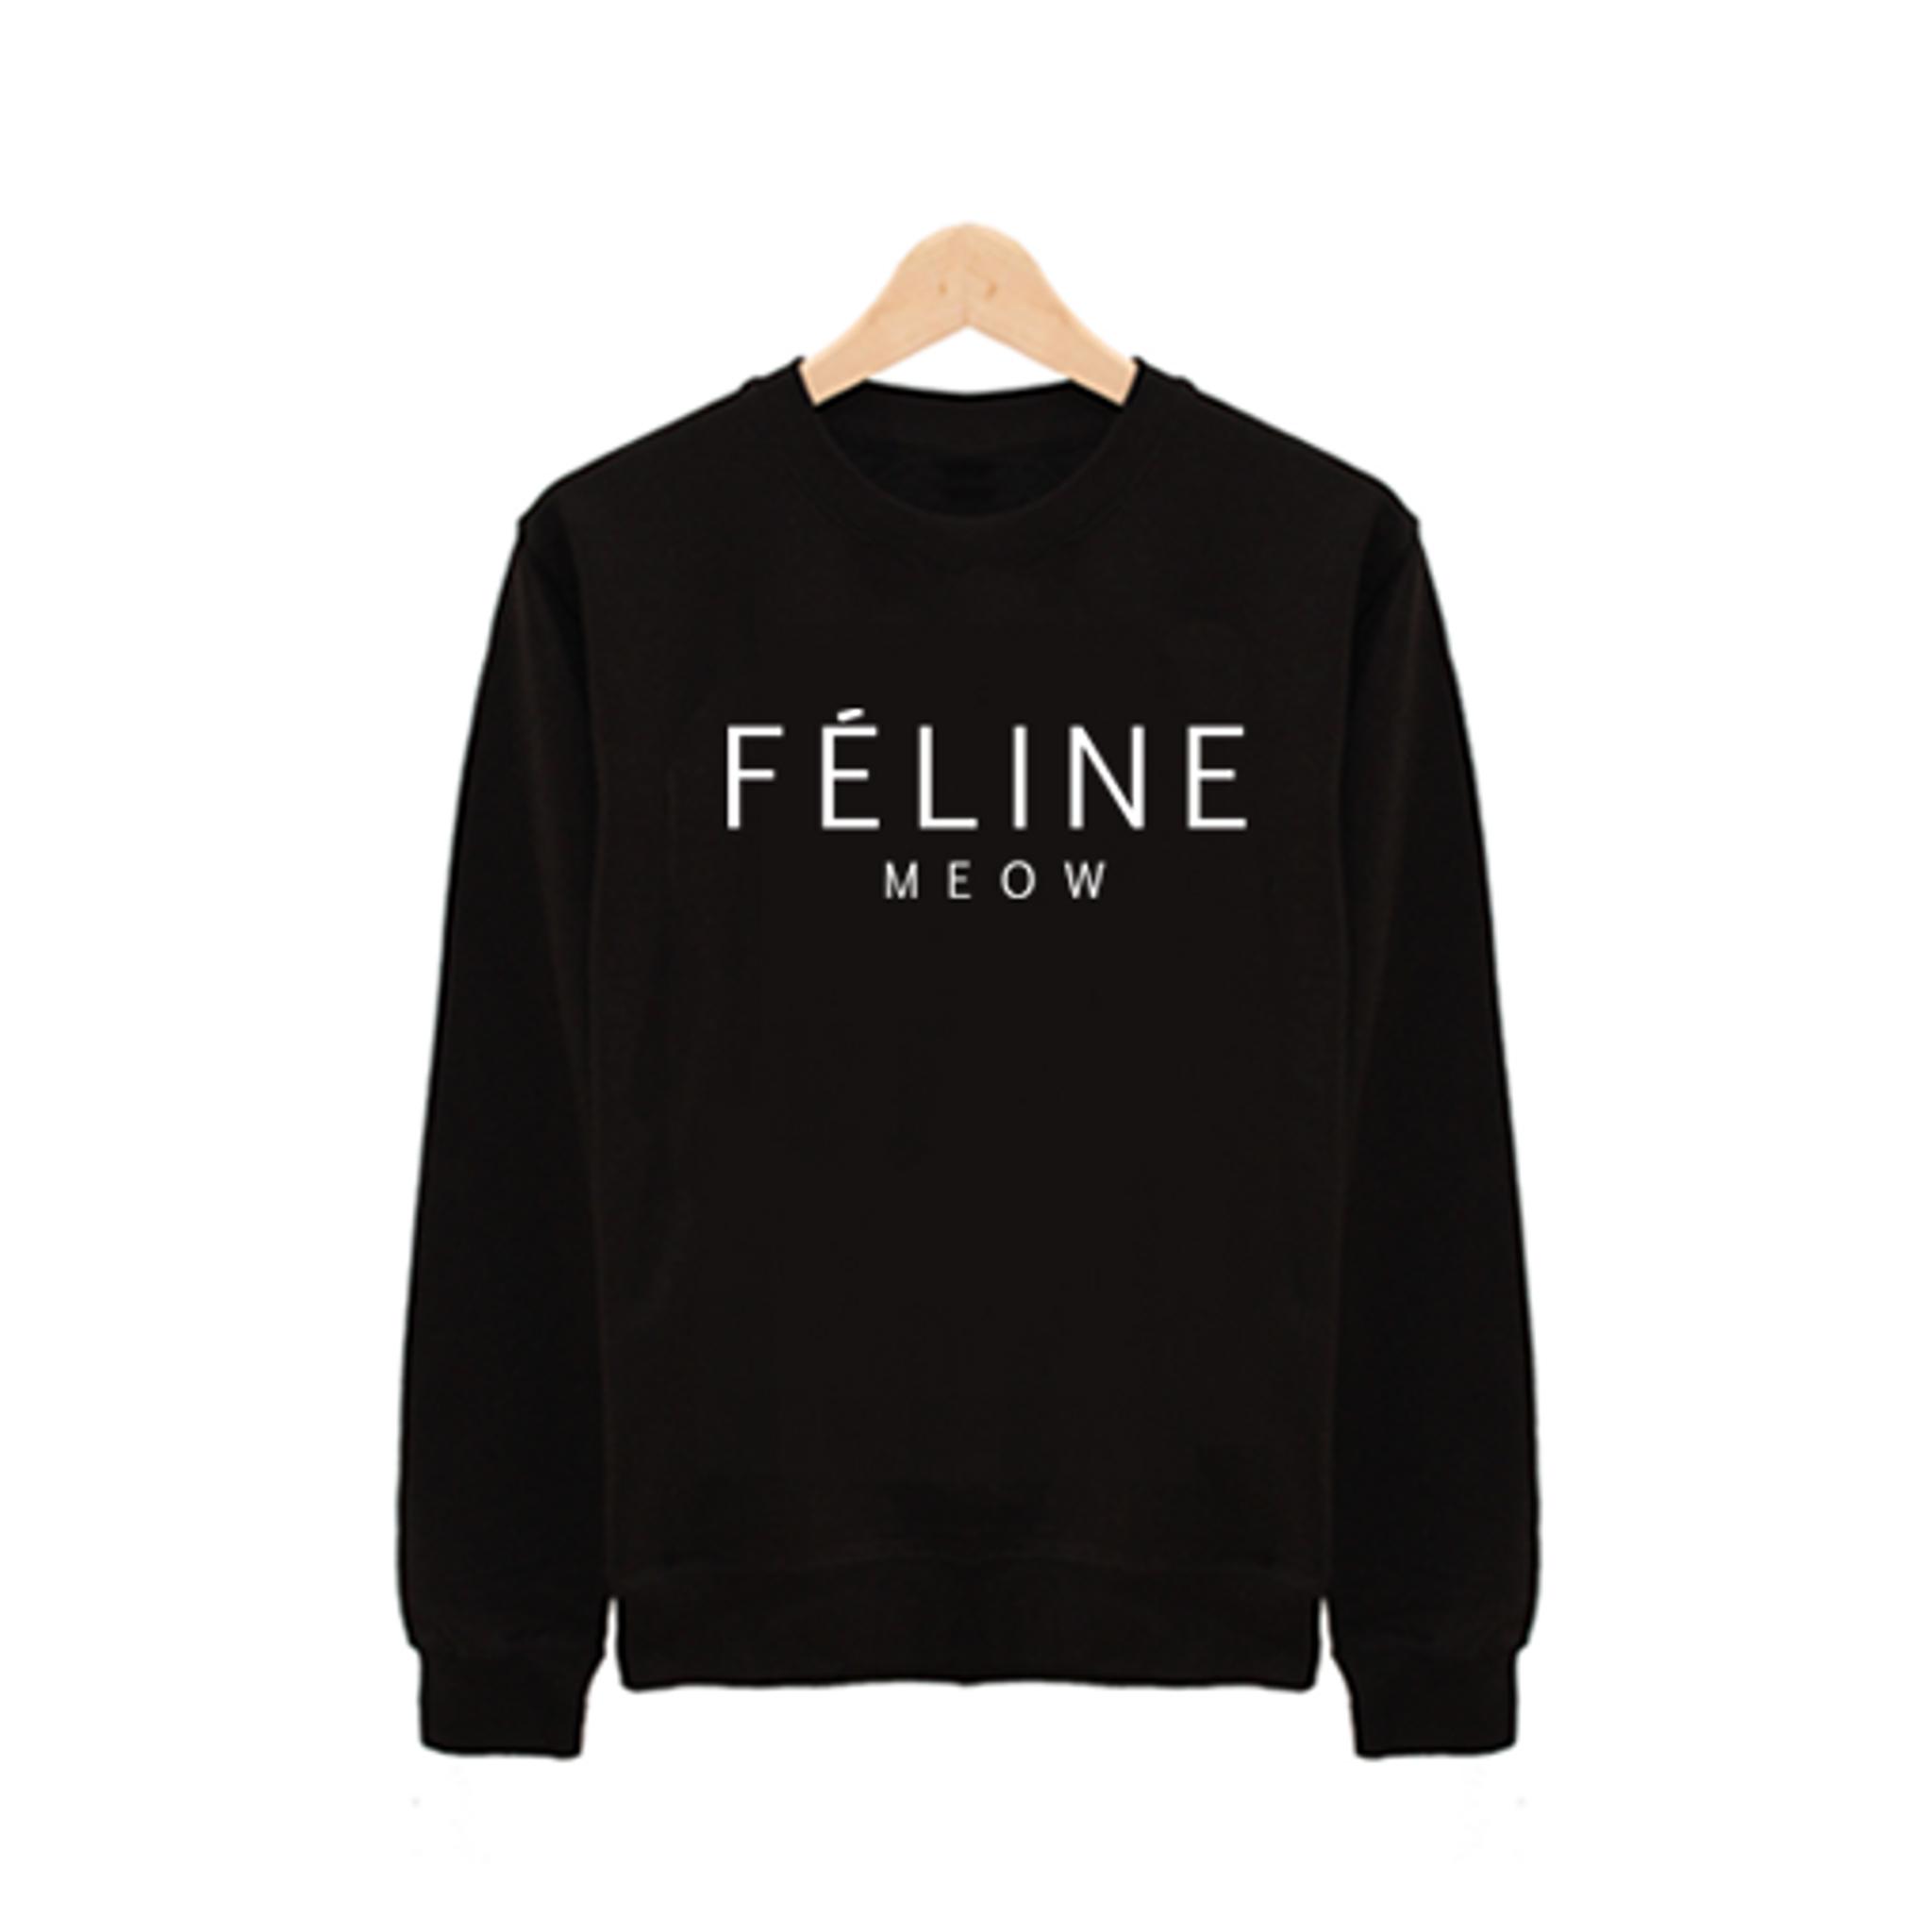 Fifth Avenue Meow Feline Printed Sweatshirt - Black